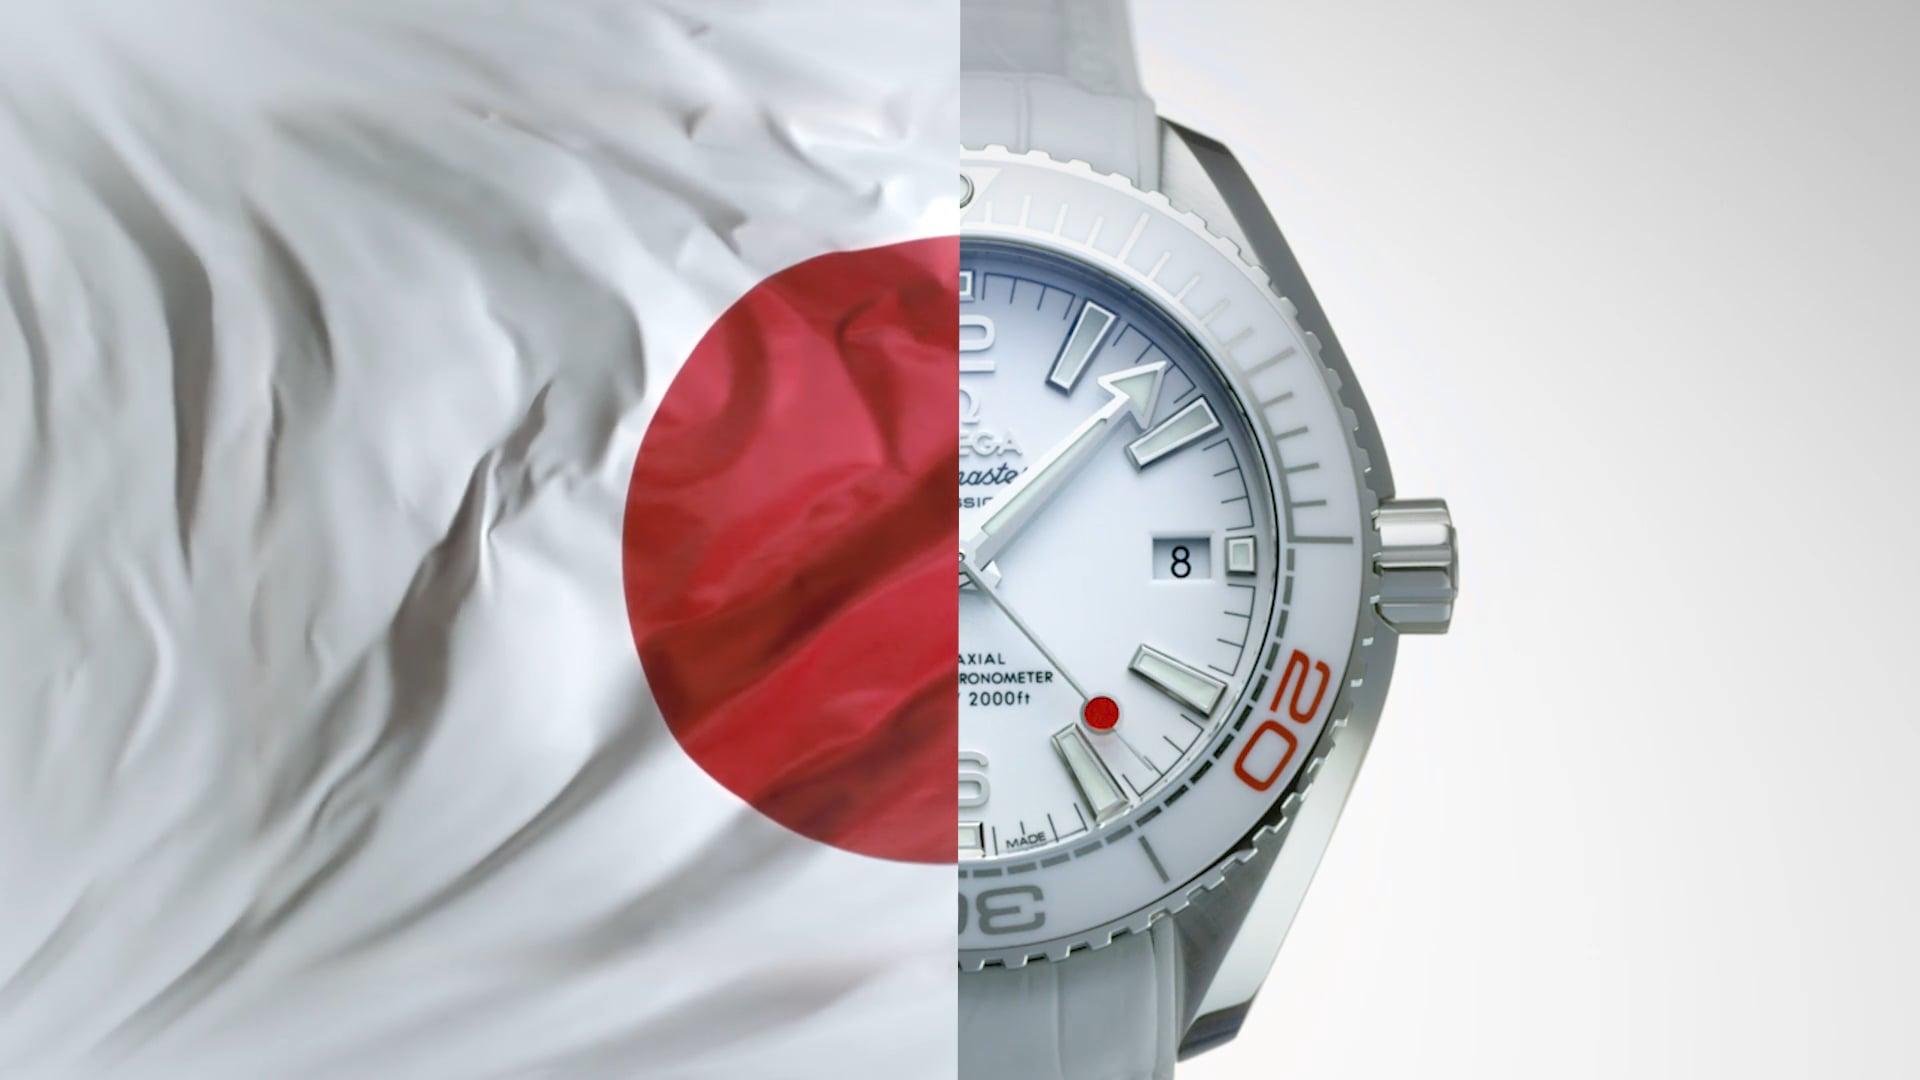 OMEGA MEETS JAPAN